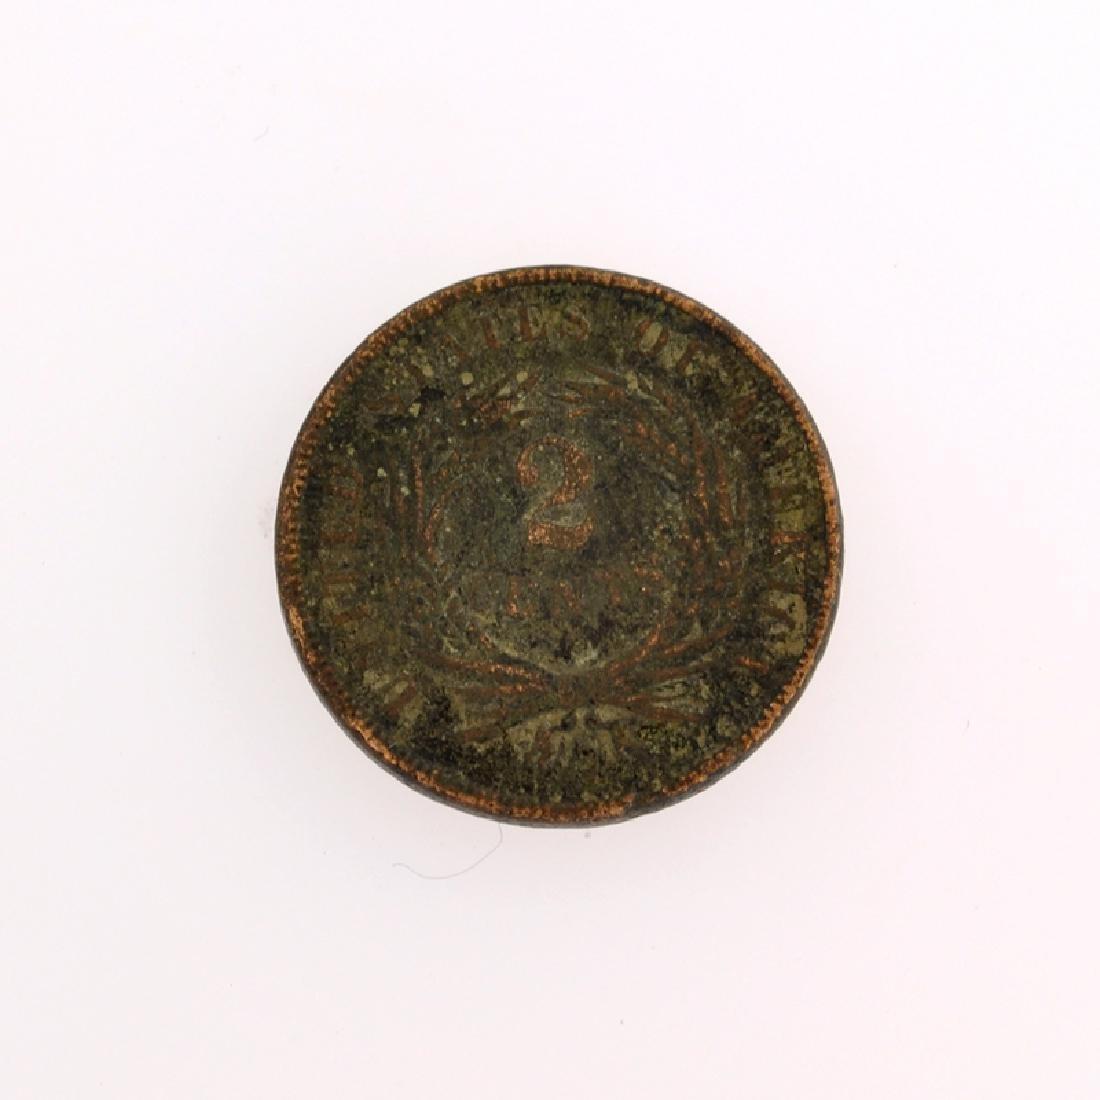 XXXX Two-Cent Piece Coin - 2